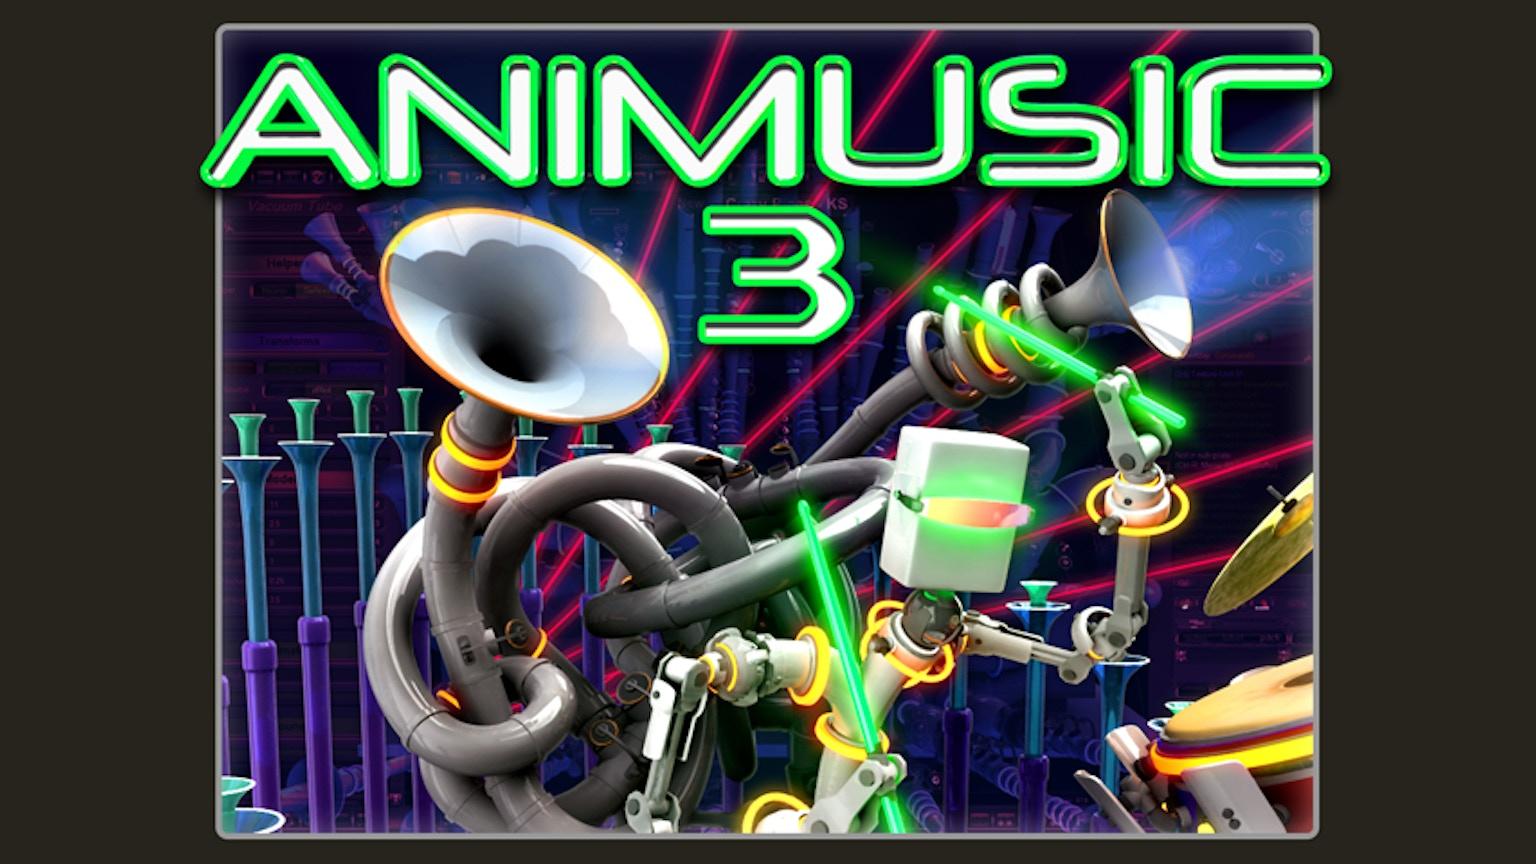 ANIMUSIC 3 (DVD / Blu-ray) by ANIMUSIC —Kickstarter